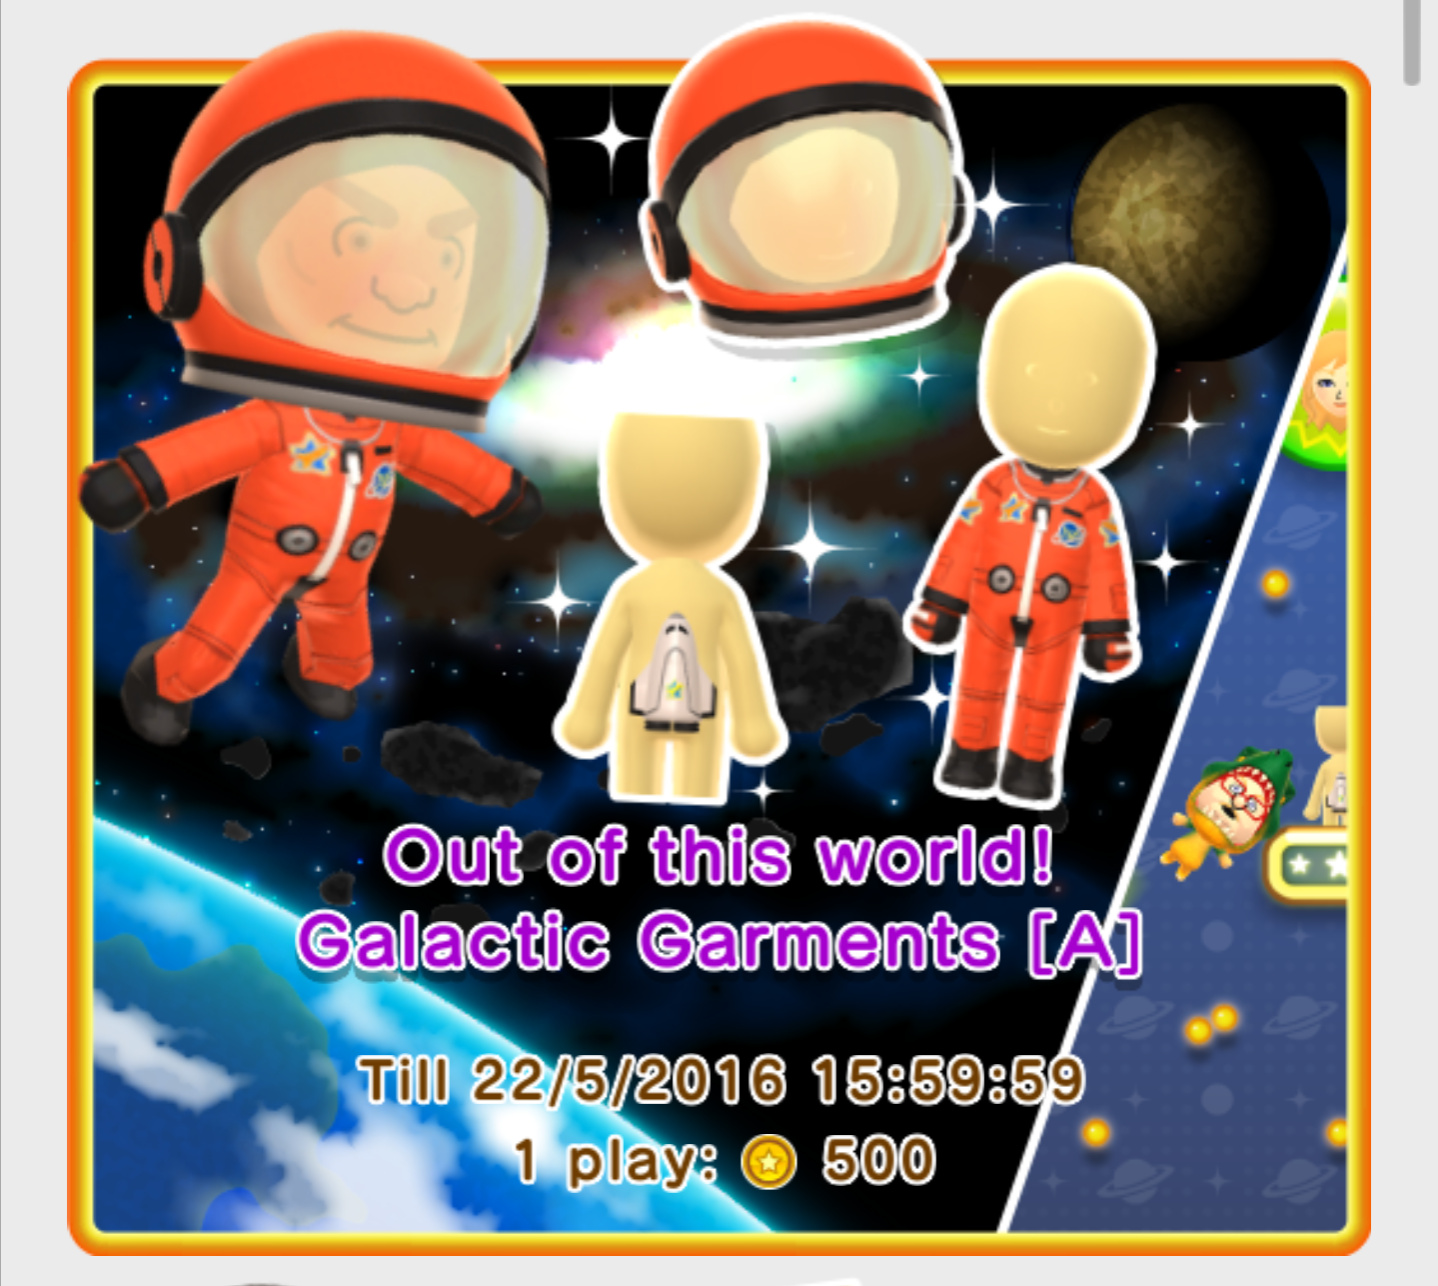 info space nintendo